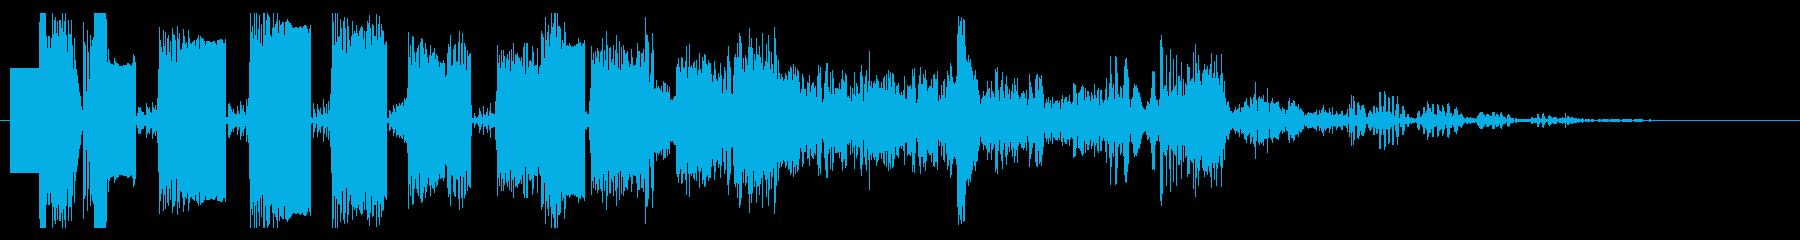 KANT8bit効果音082446の再生済みの波形